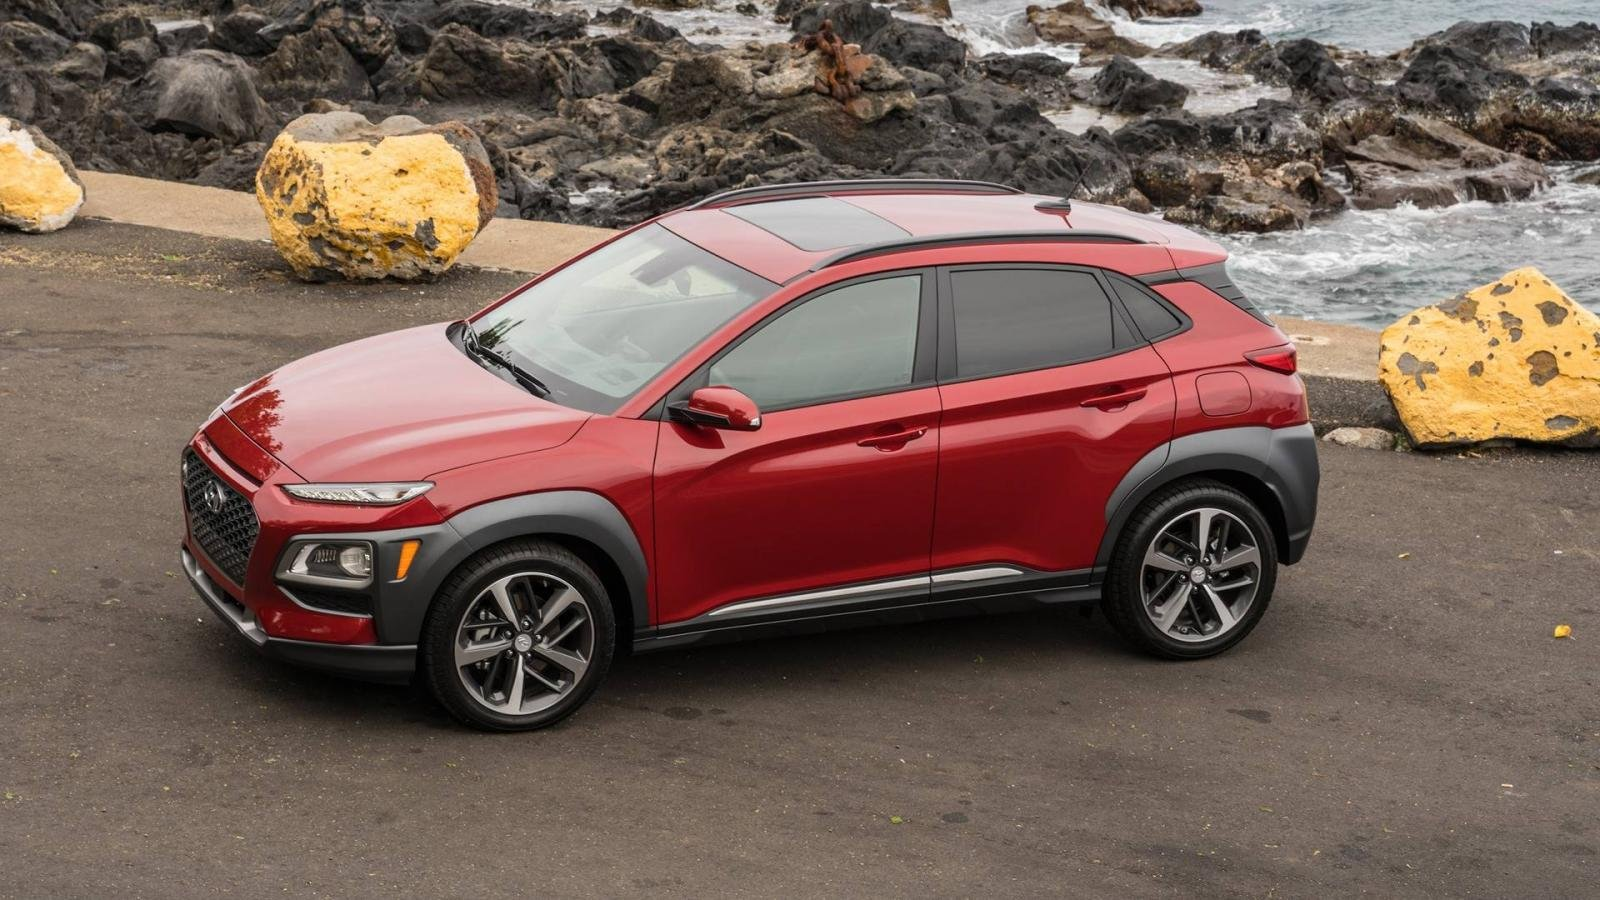 Đánh giá xe Hyundai kona 2019